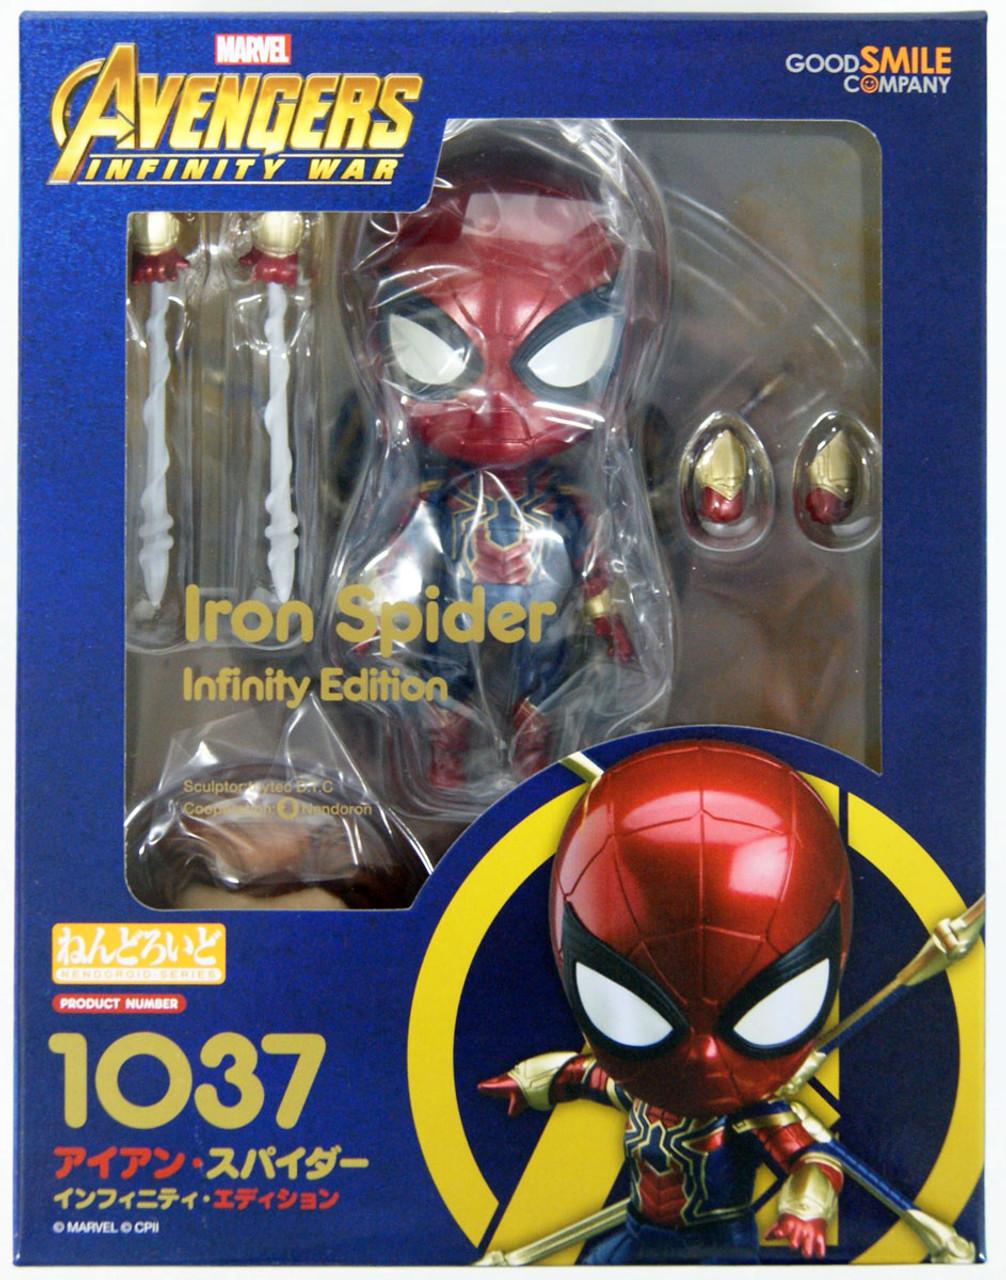 Nendoroid Avengers Infinity War Spider Man Infinity Edition Good Smile Company**